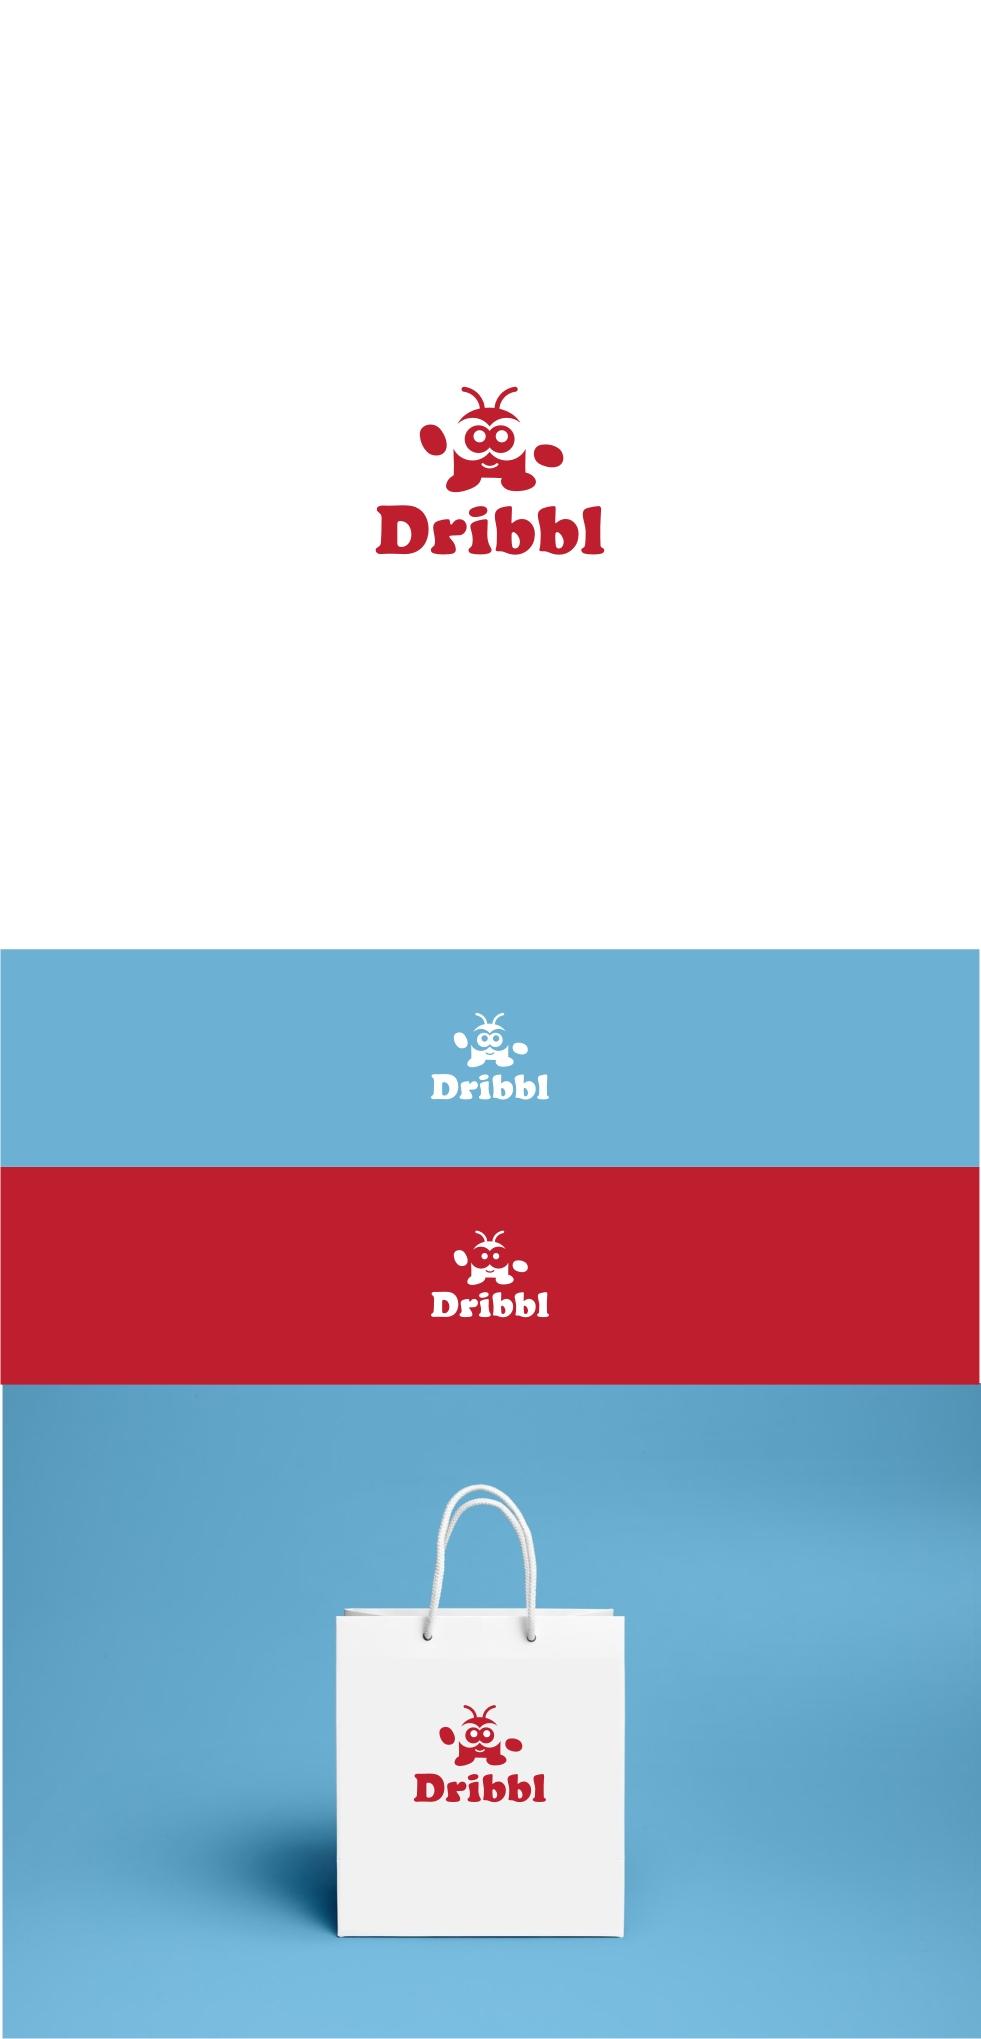 Разработка логотипа для сайта Dribbl.ru фото f_8755aa0ce49326d6.jpg